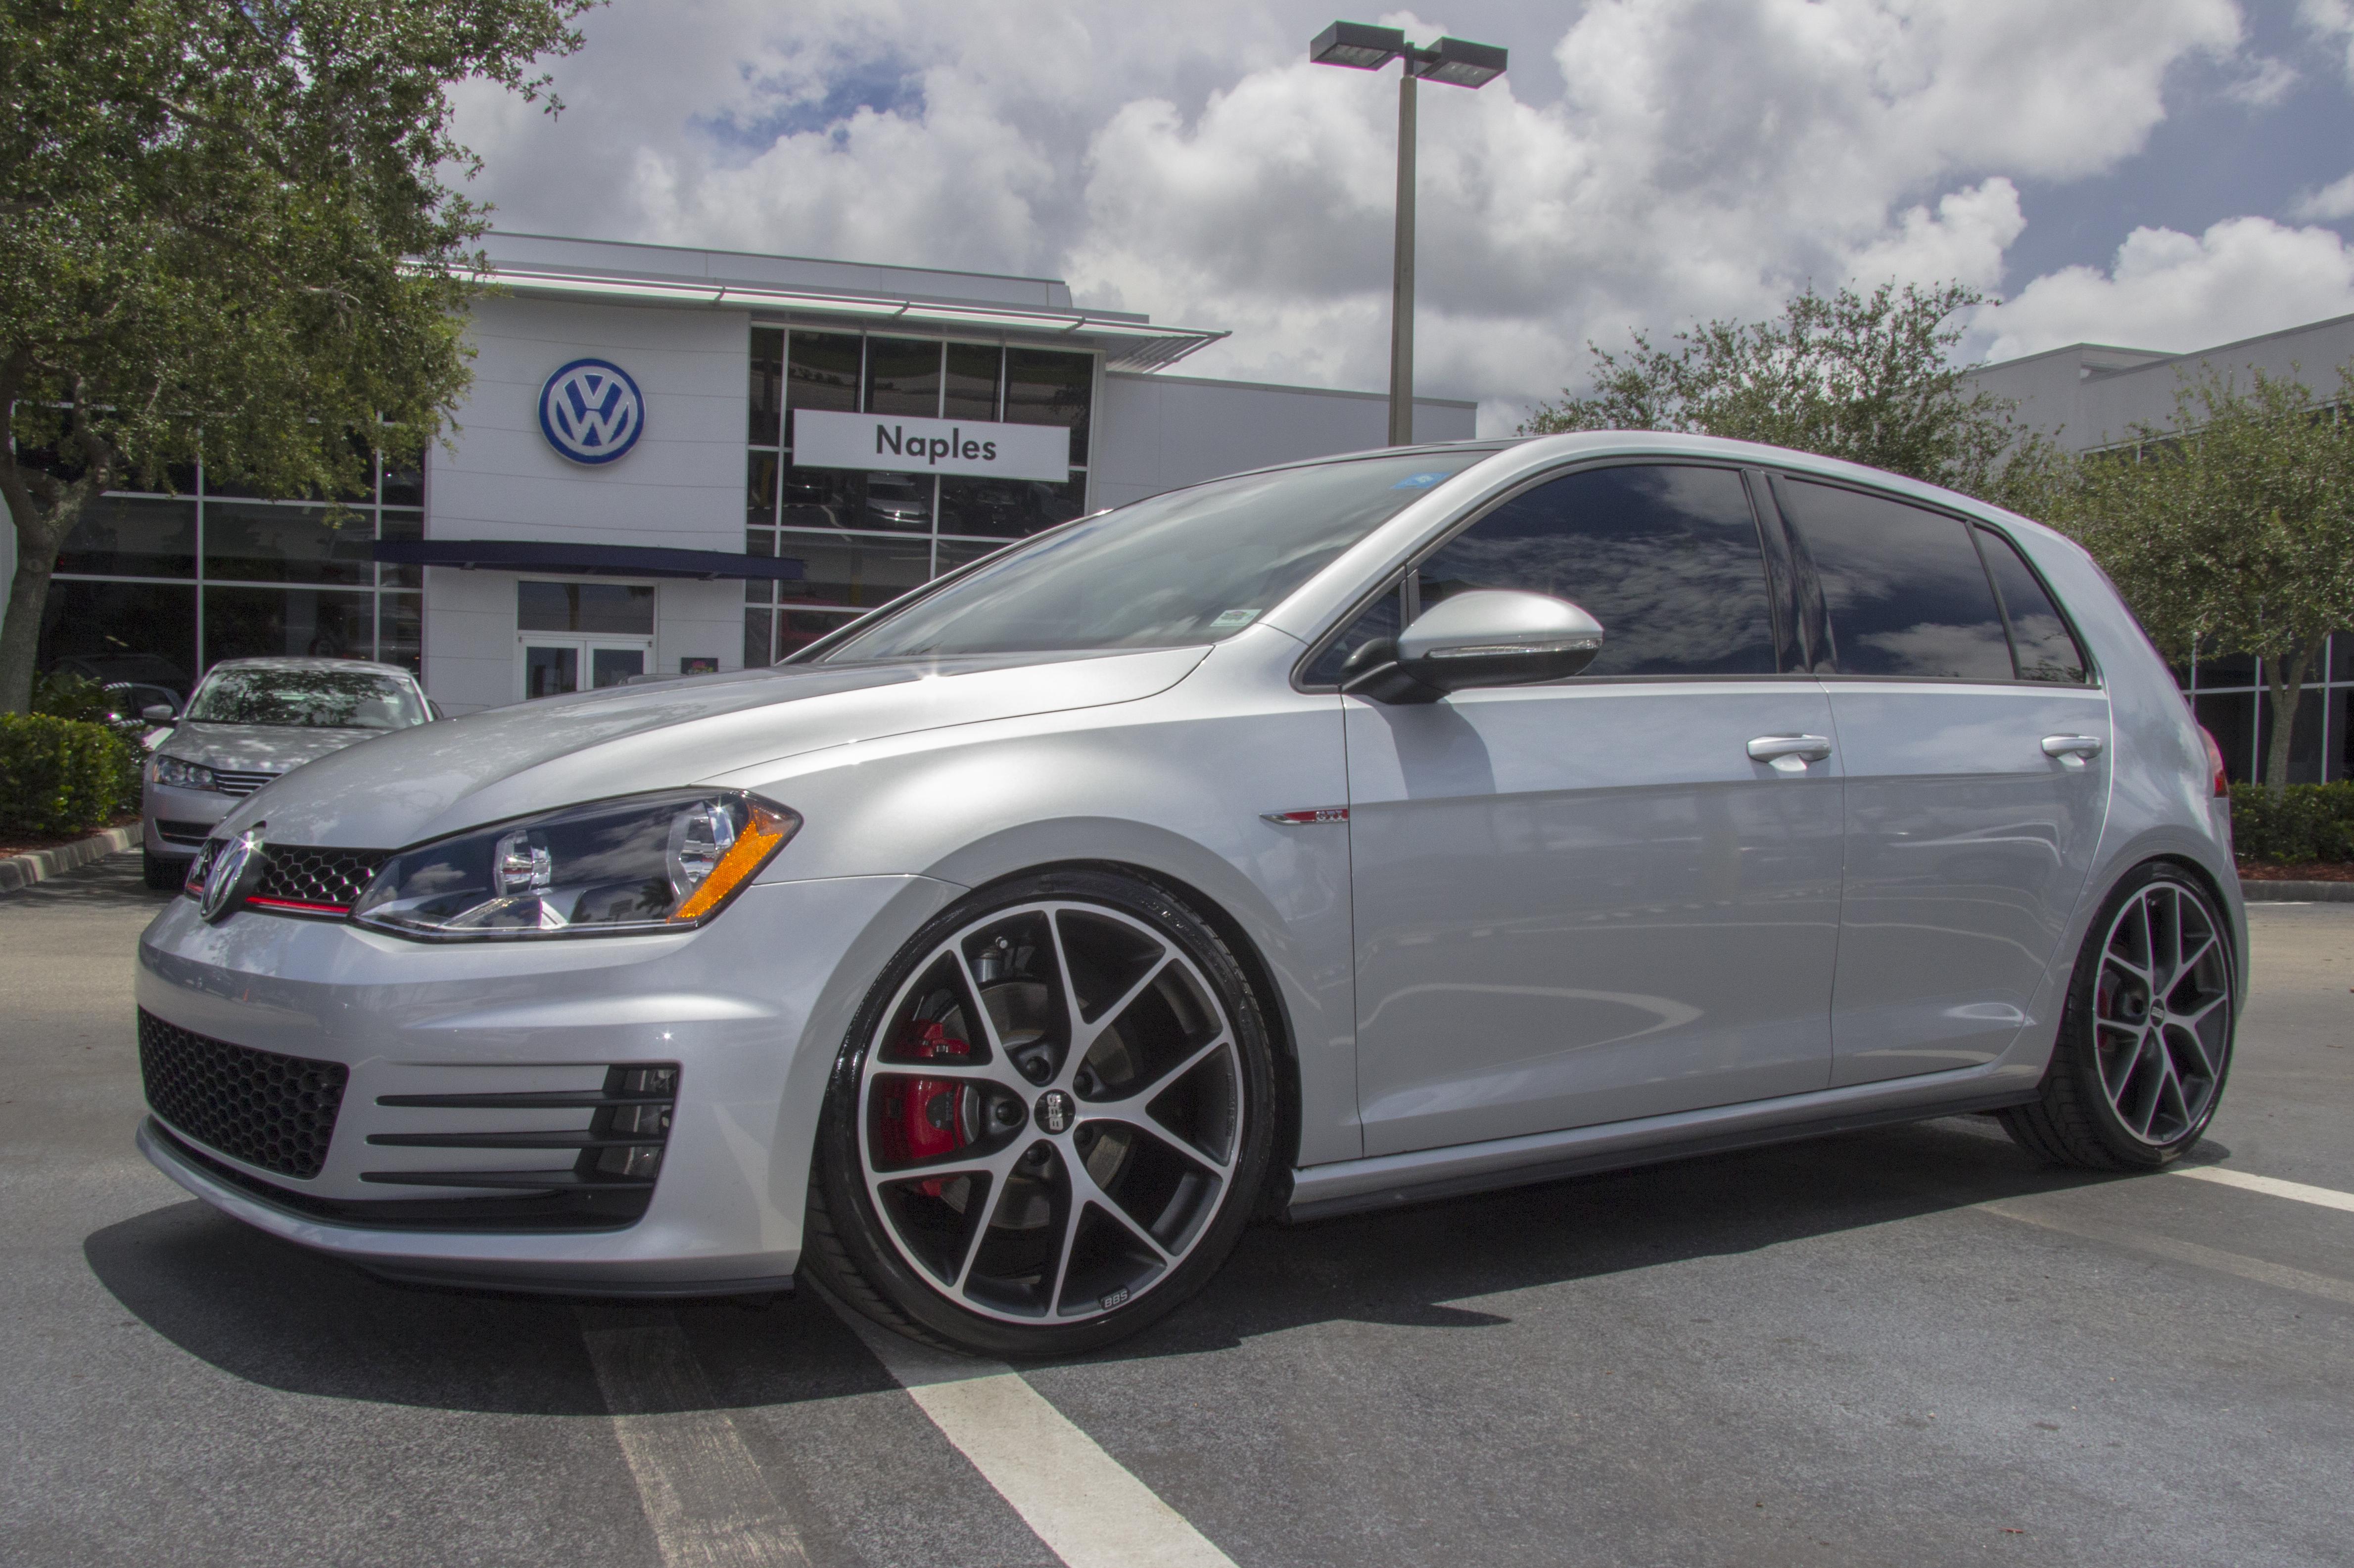 MKVII On BBS SR Wheels – Advanced Automotive Accessories